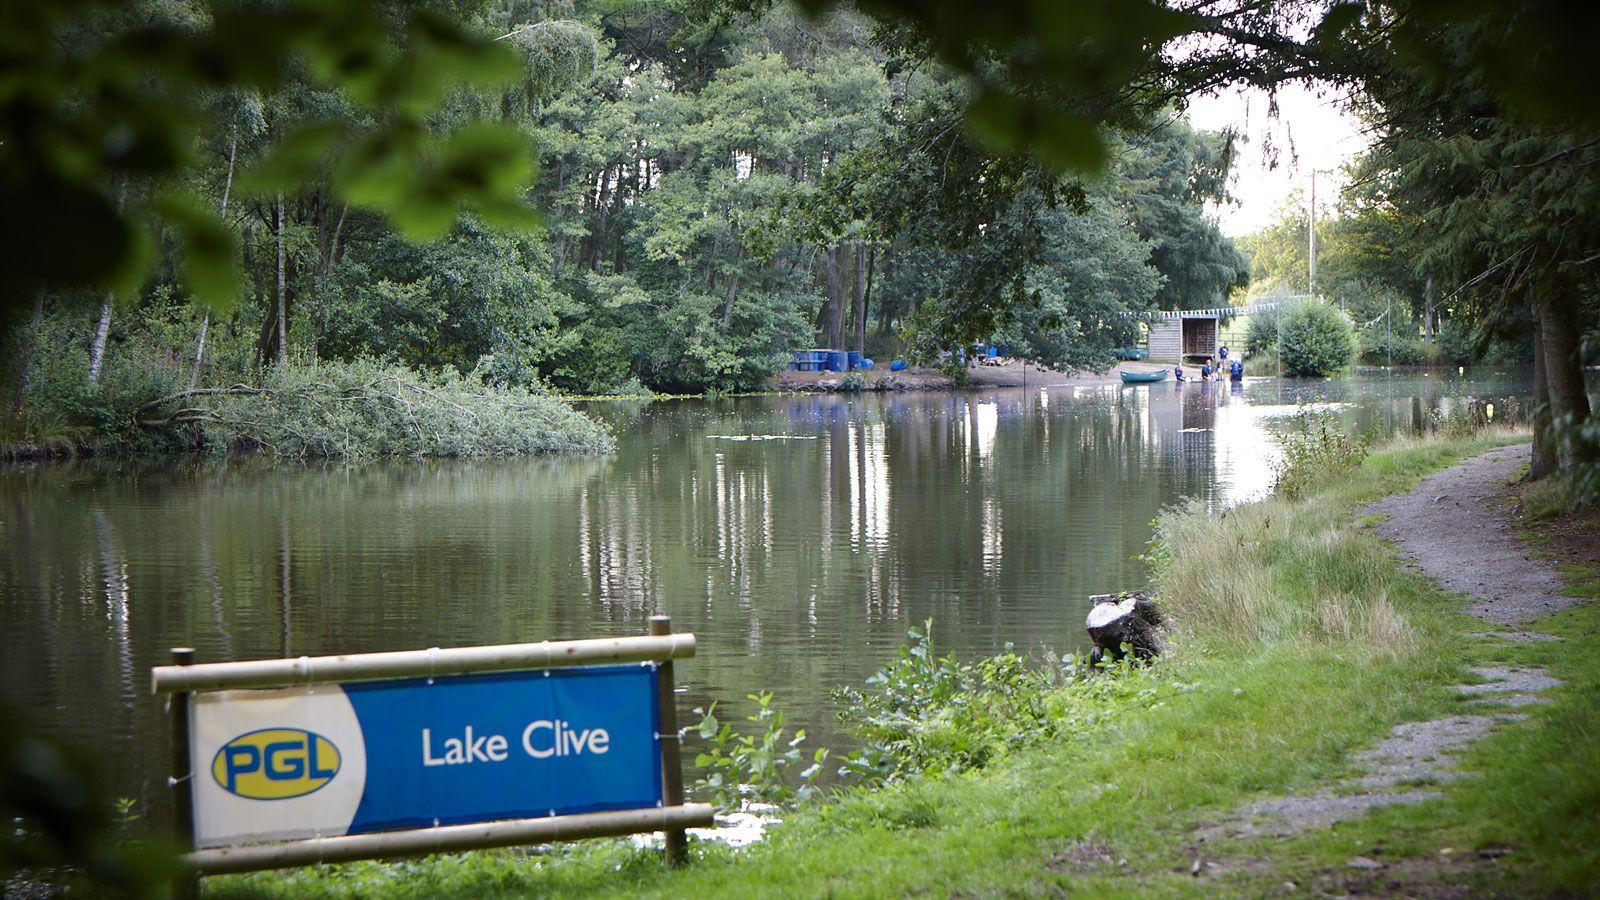 Pgl Boreatton Park Accommodation Boreatton Park Adventure